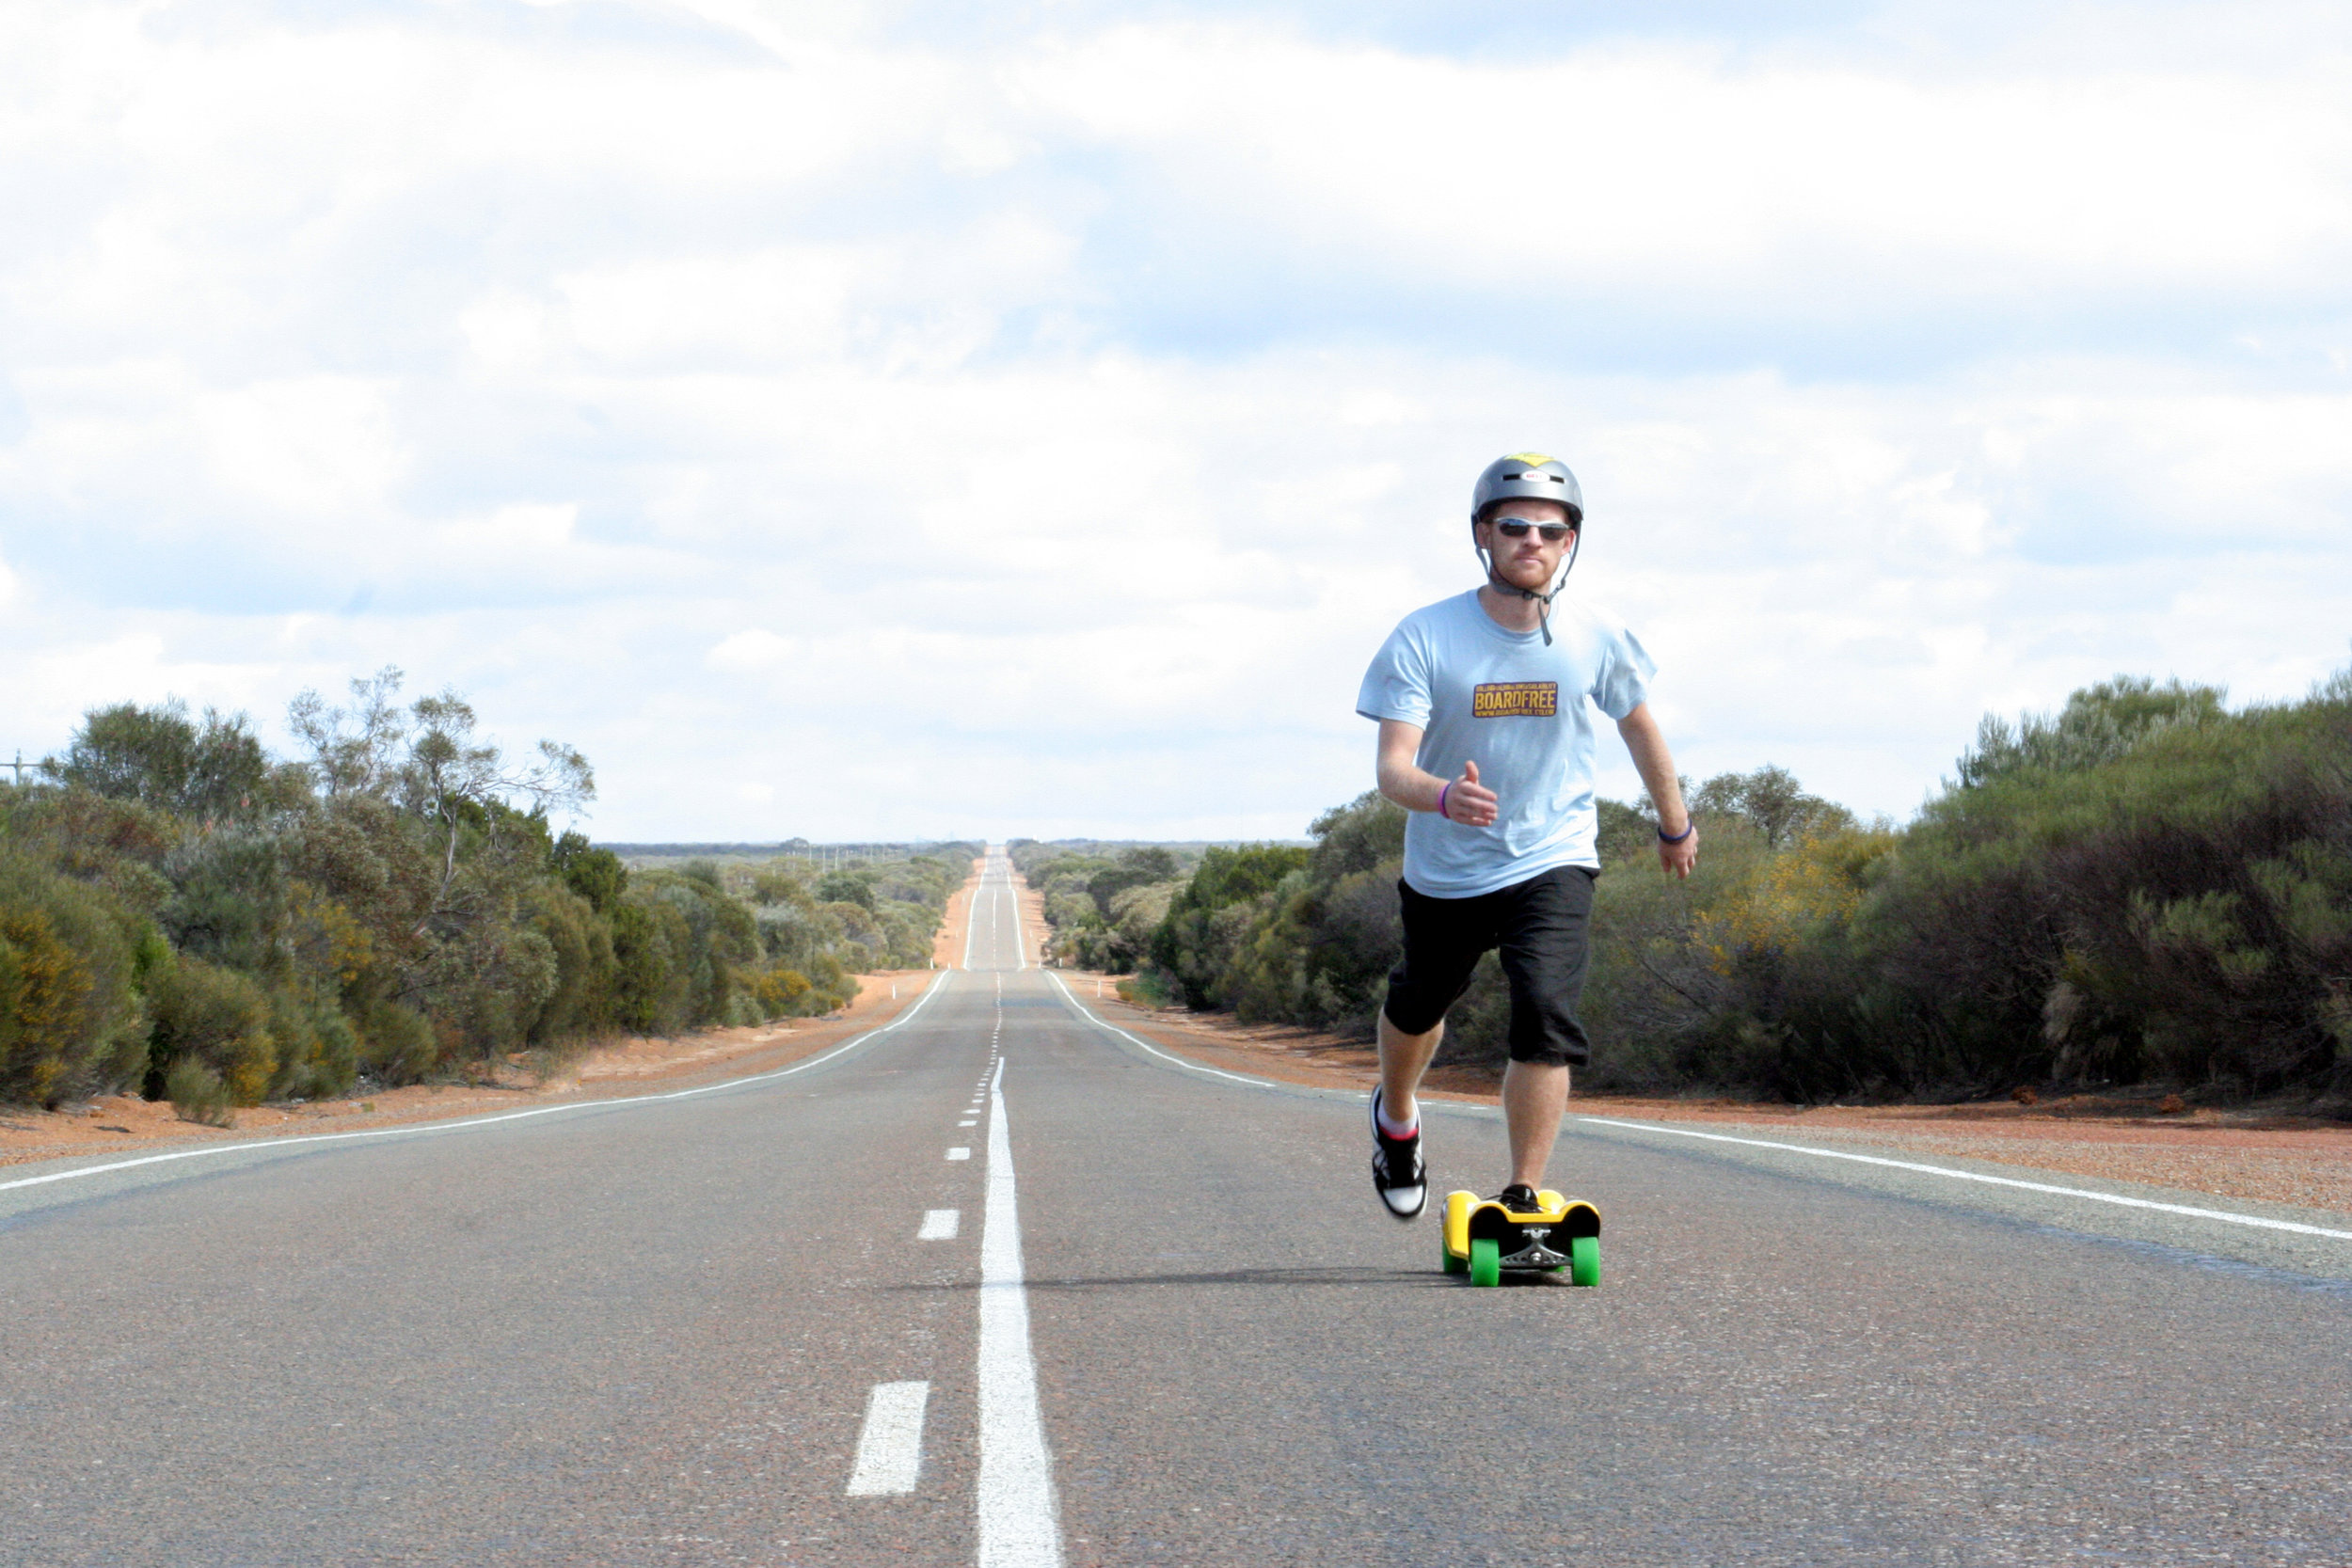 Skate. BoardFree ©2012 Dave Cornthwaite. Photo by Holly Allen.jpg